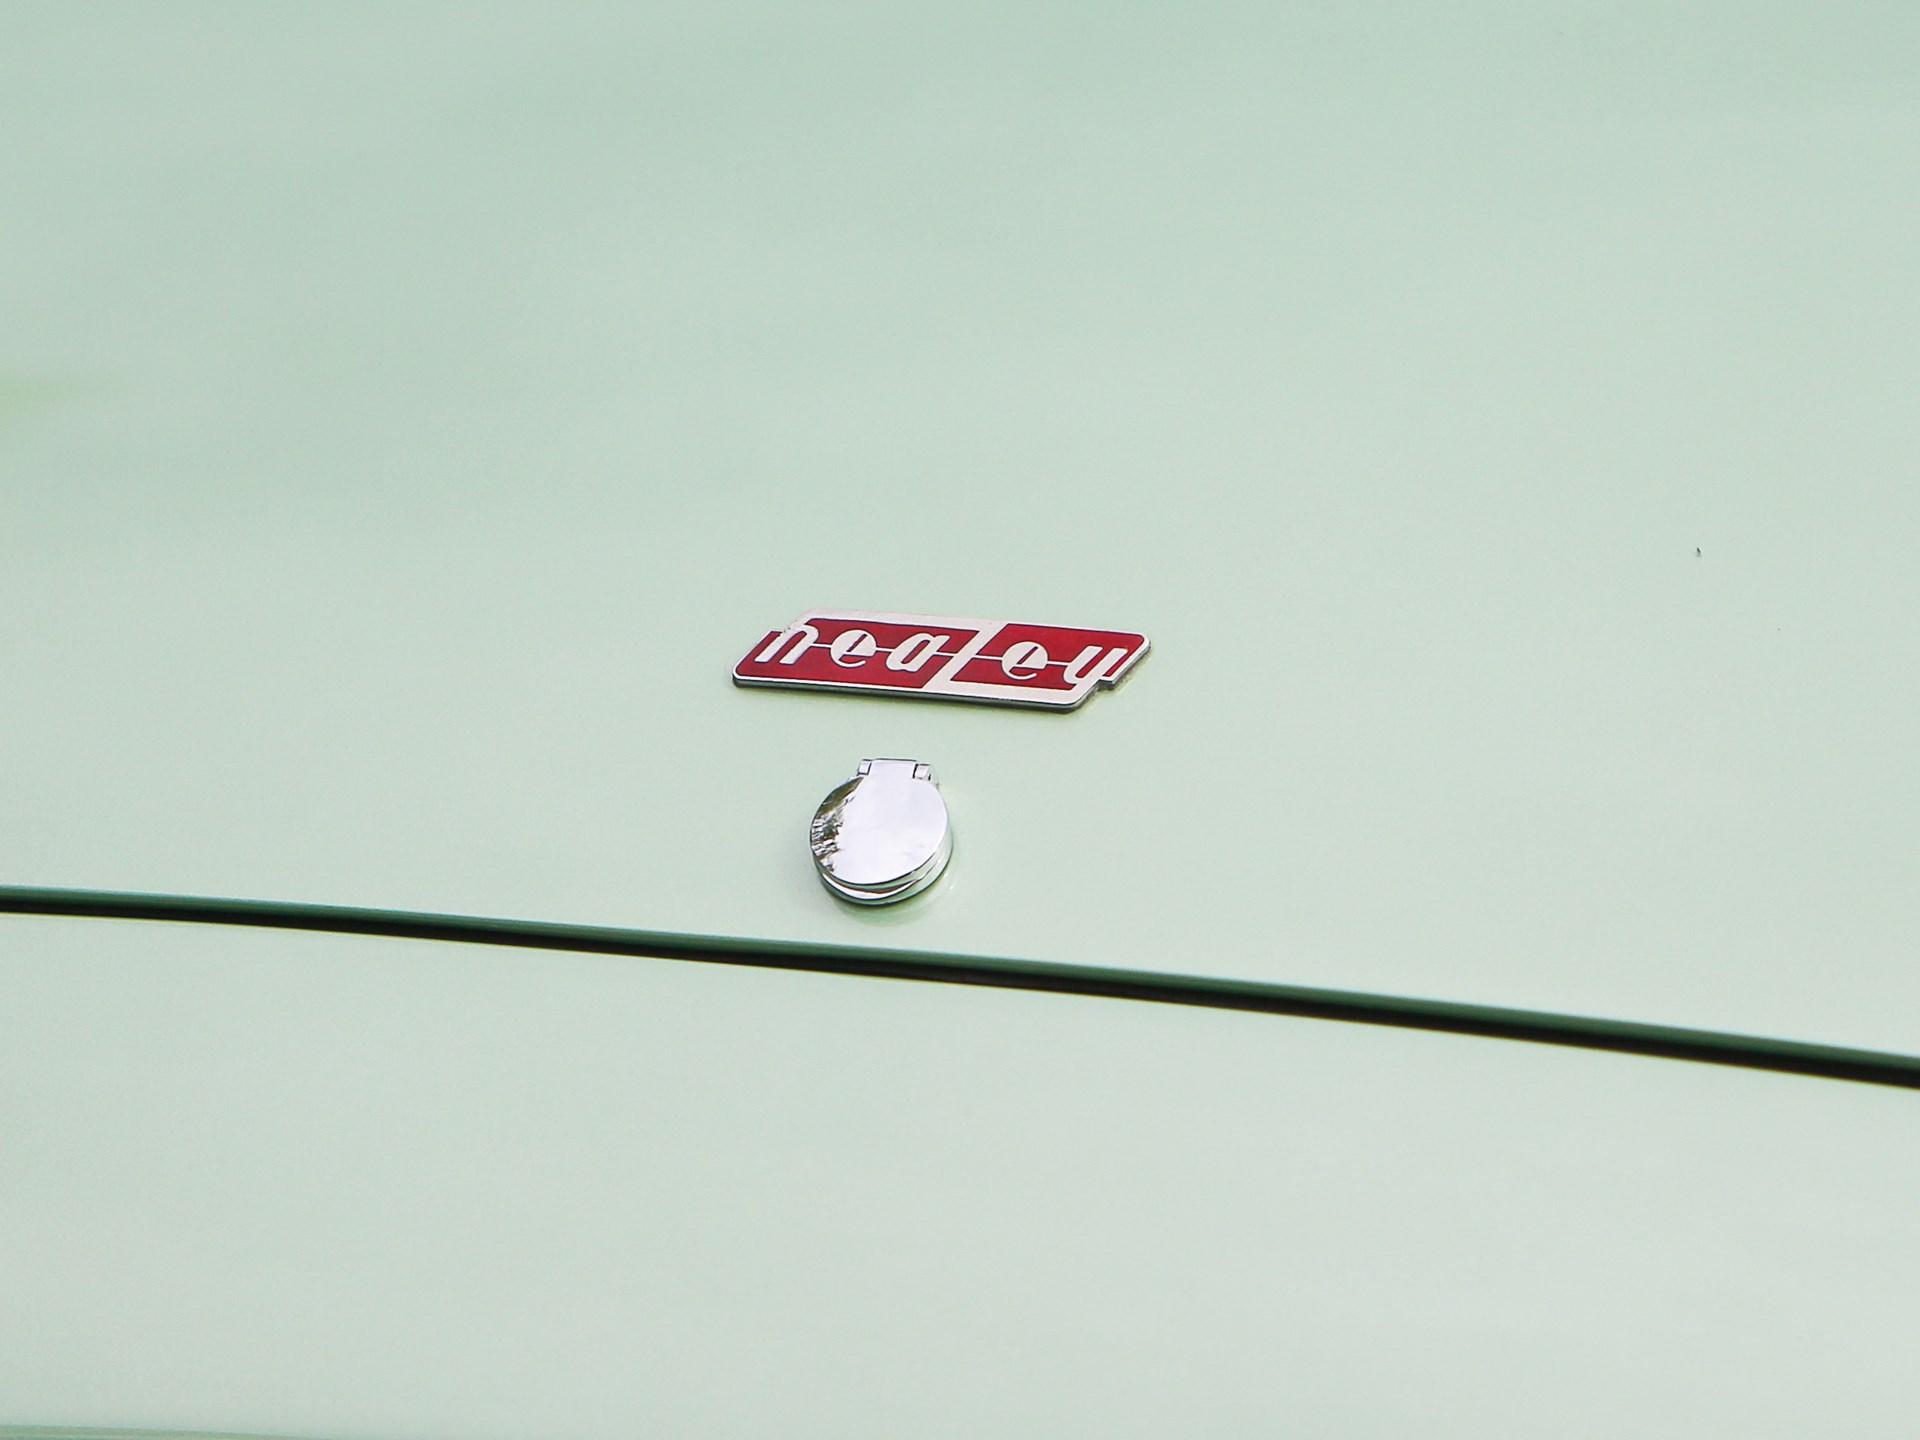 1948 Healey 2.4-Litre Westland Roadster